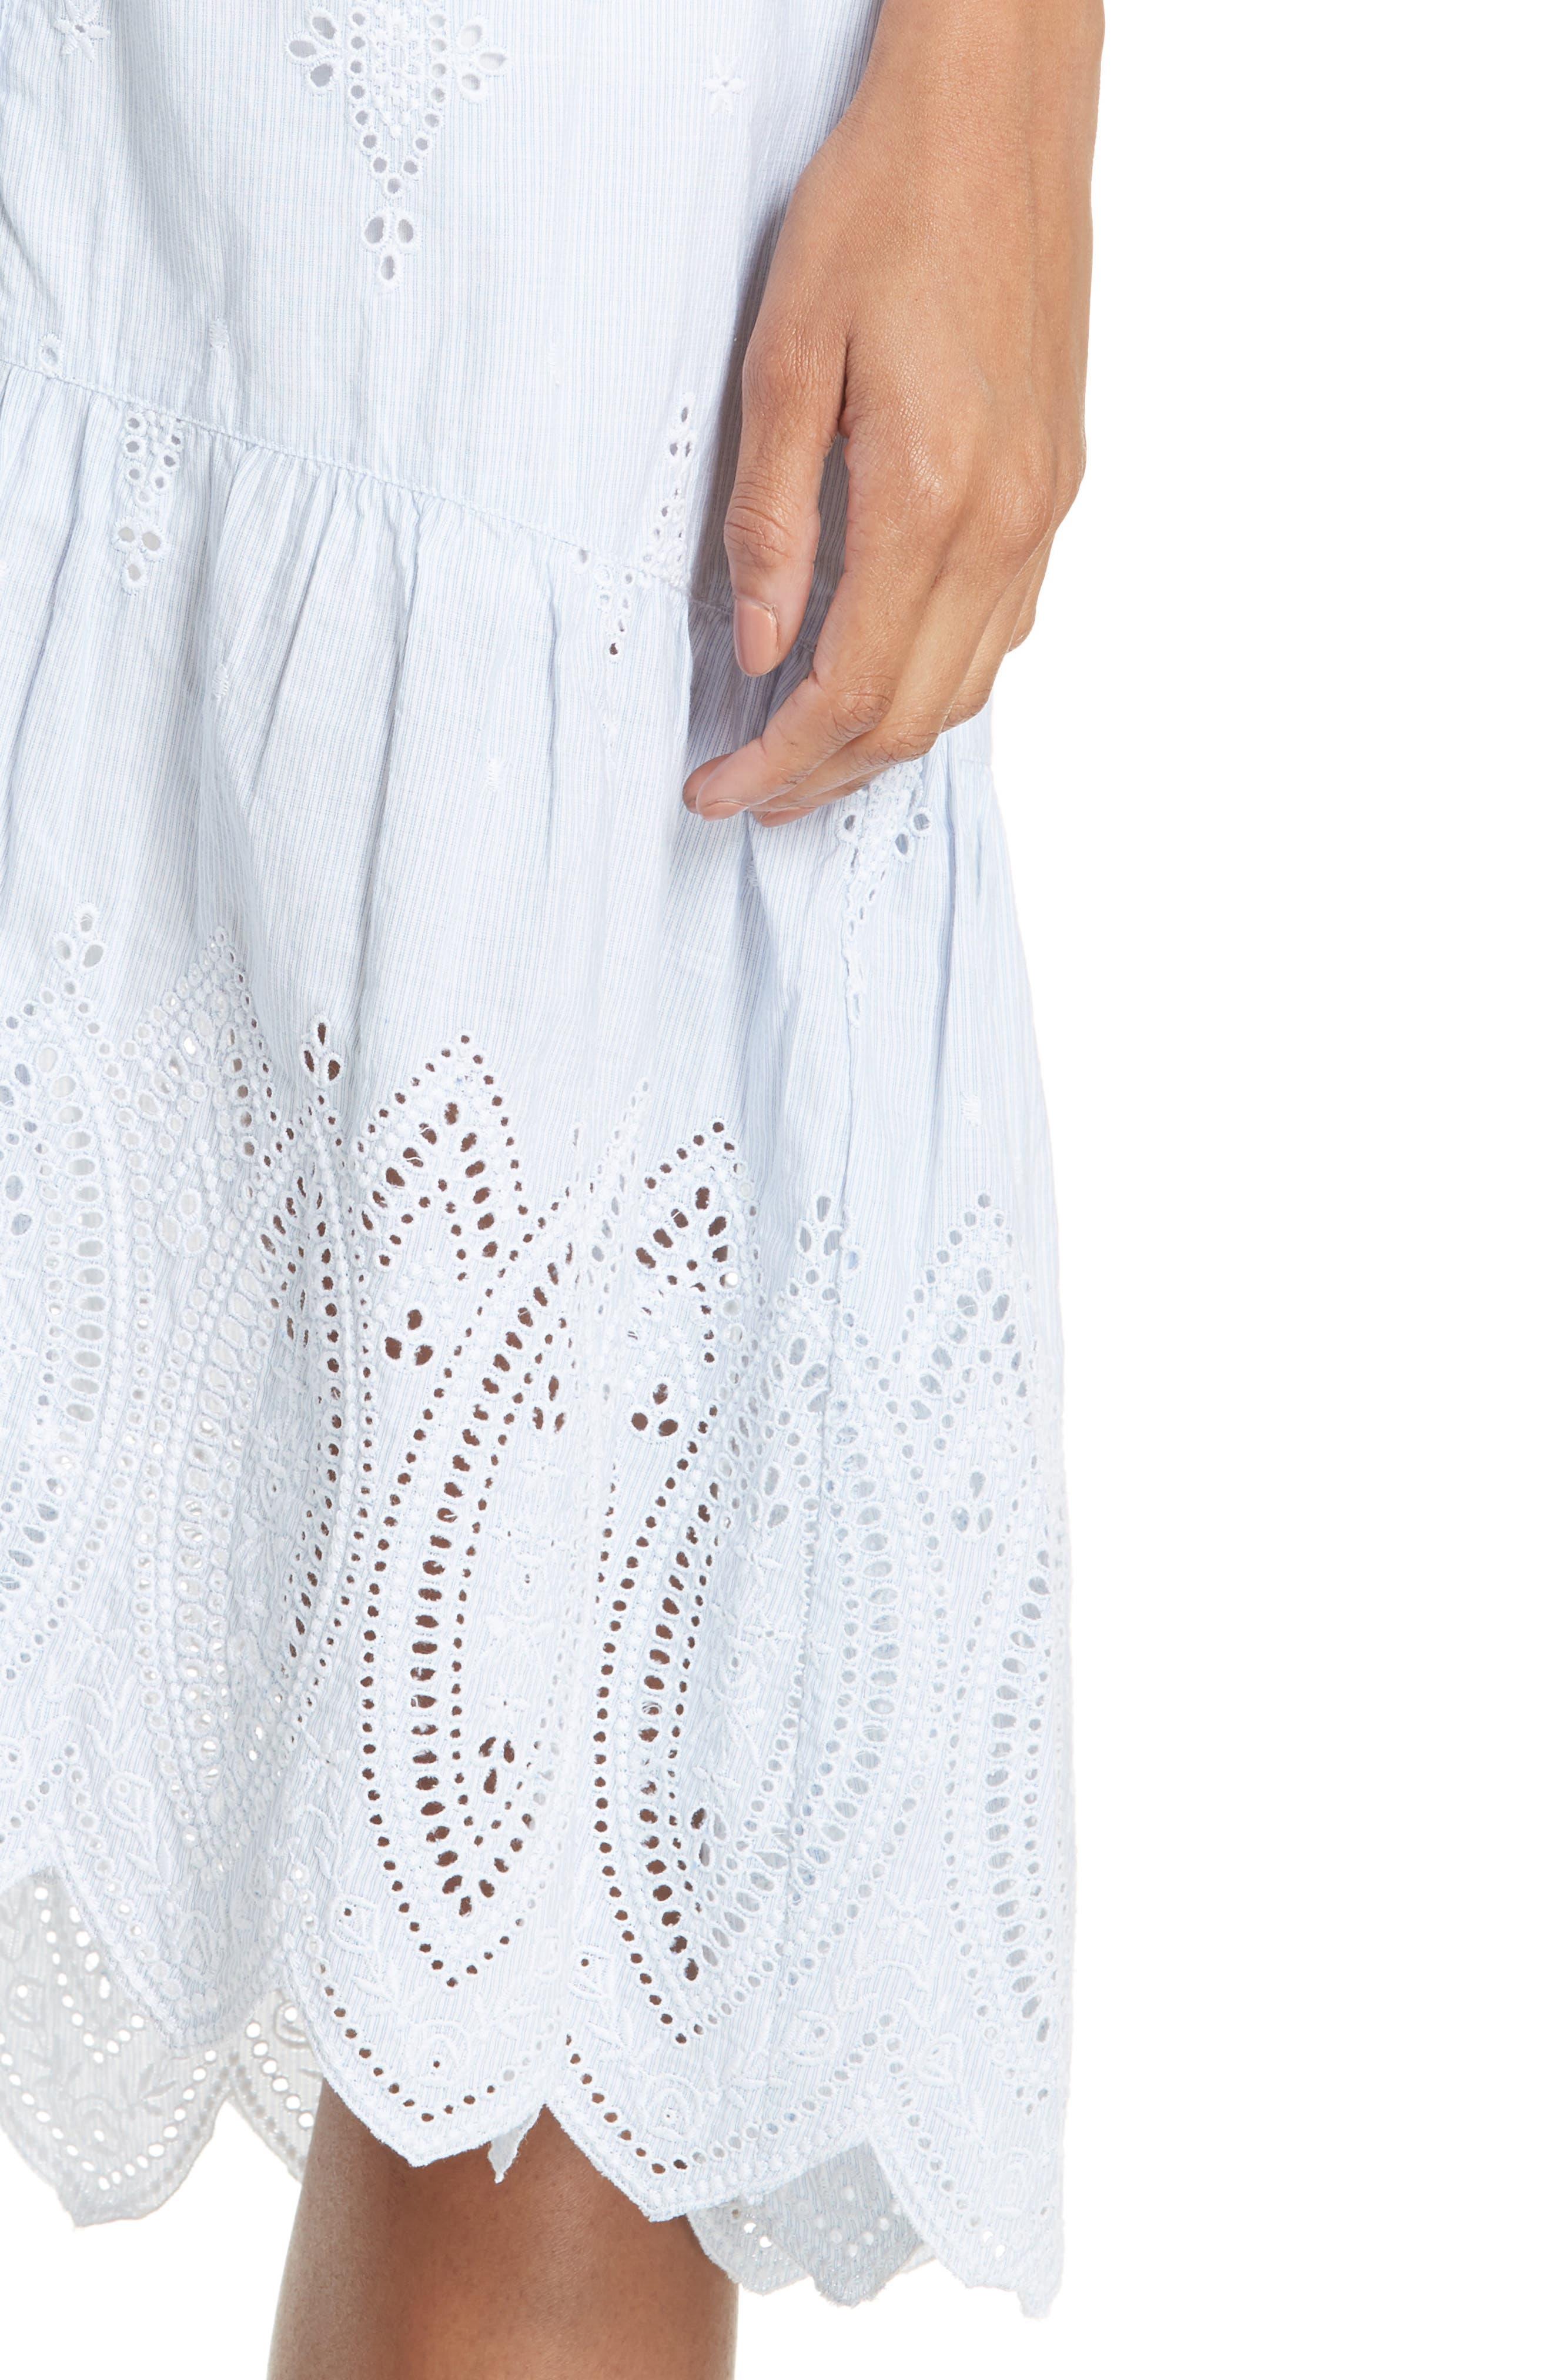 Chantoya Eyelet Scallop Hem Cotton Skirt,                             Alternate thumbnail 4, color,                             DESERT SKY